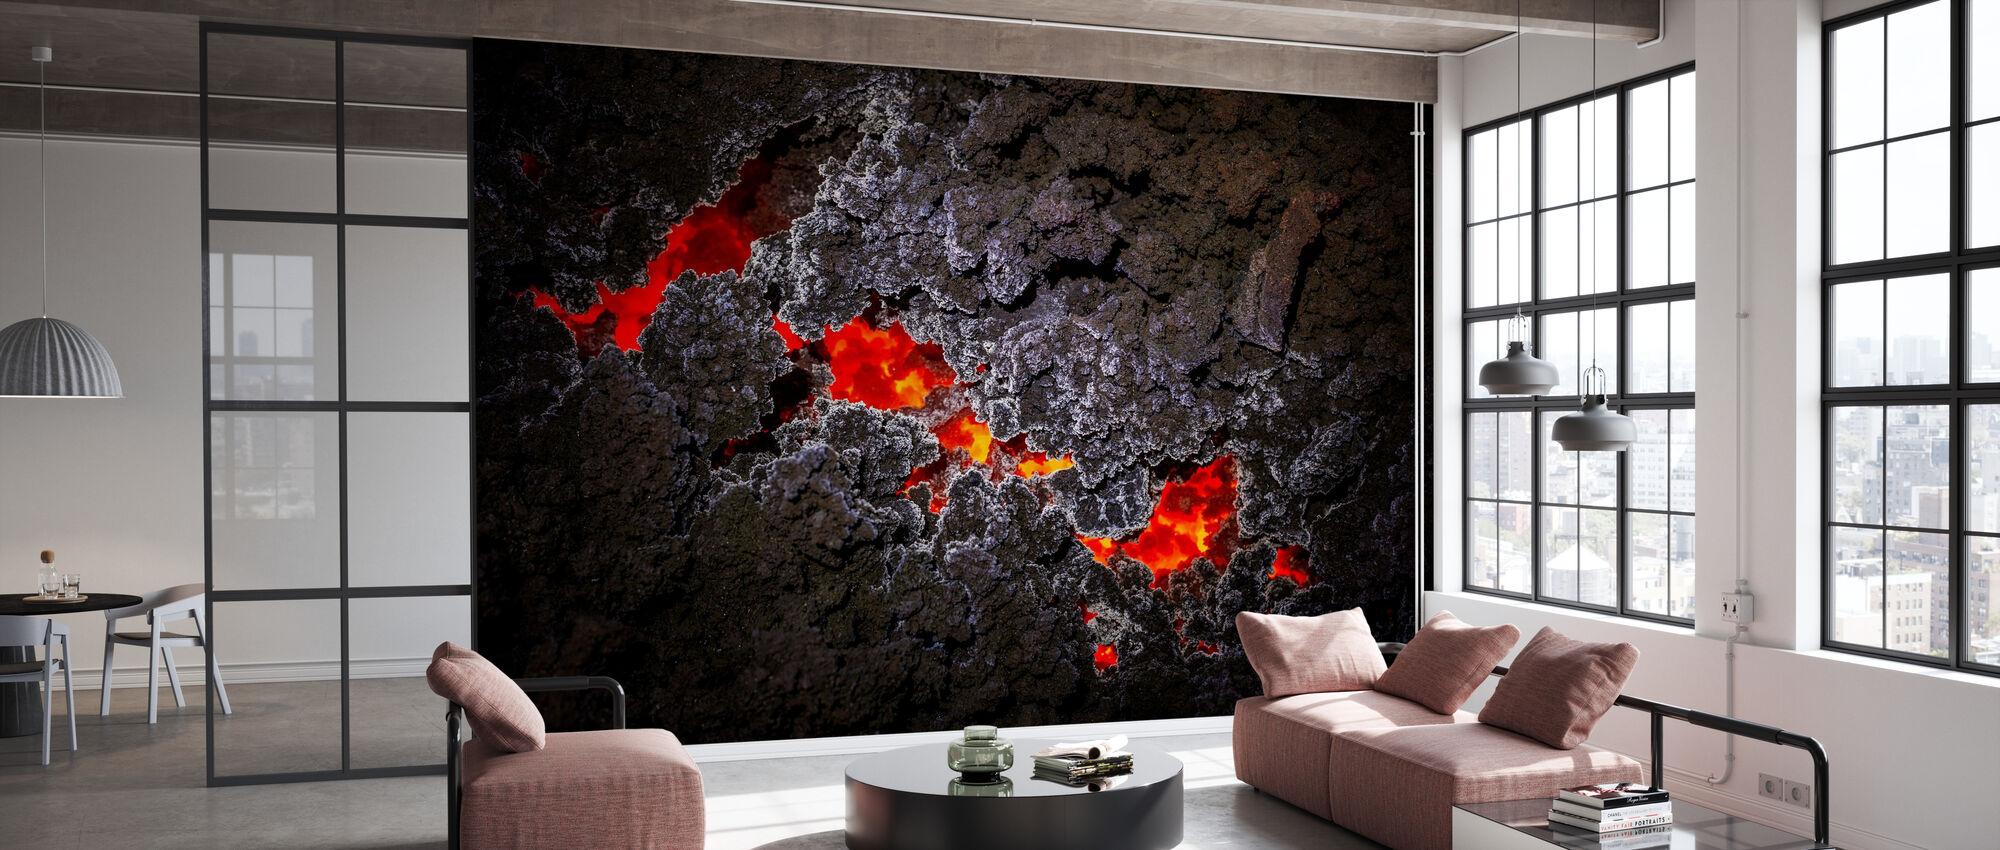 Crystallization - Wallpaper - Office